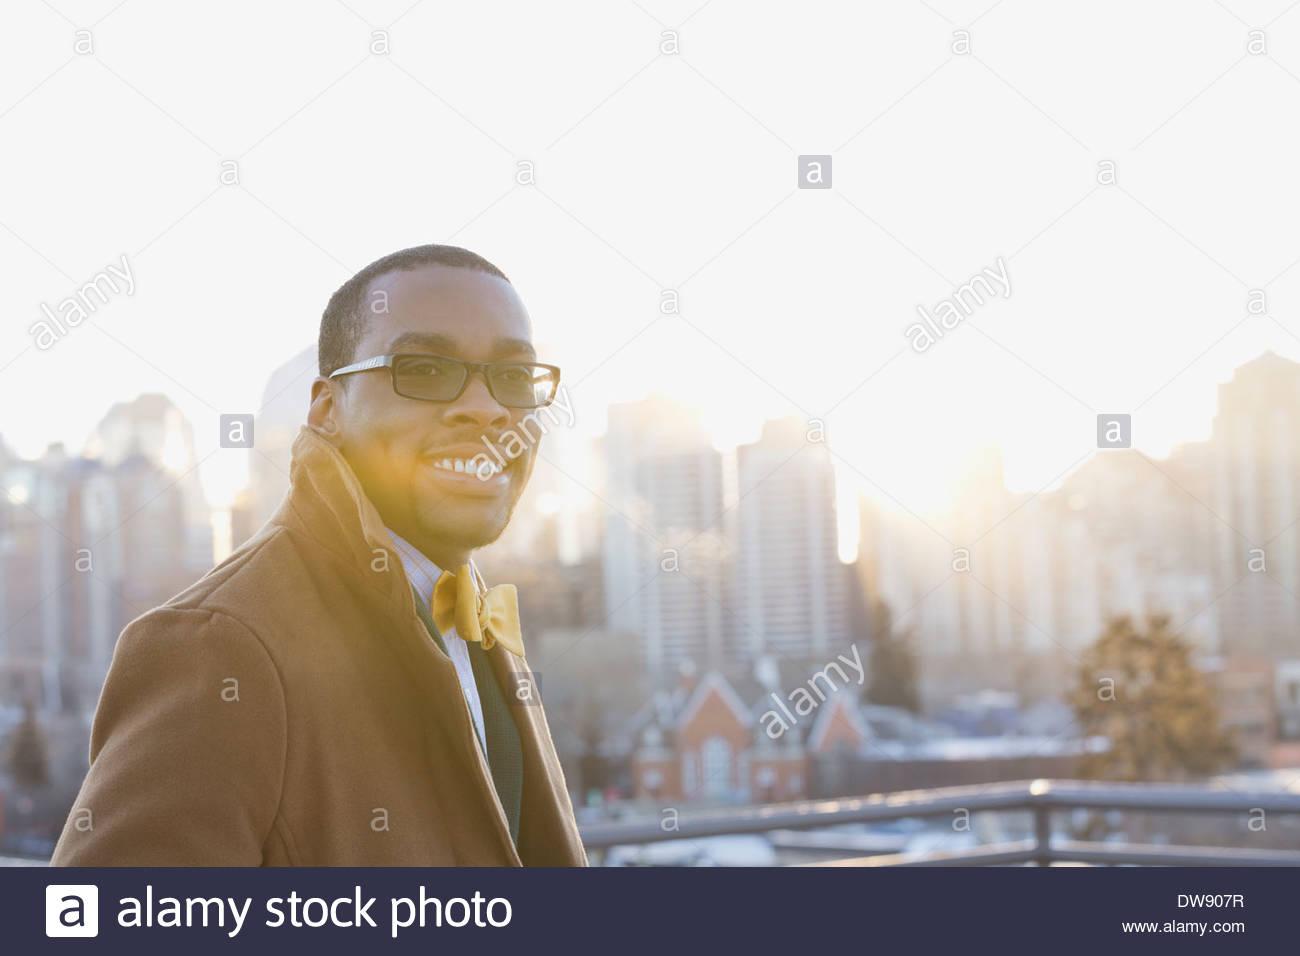 Portrait of smiling man against cityscape Photo Stock